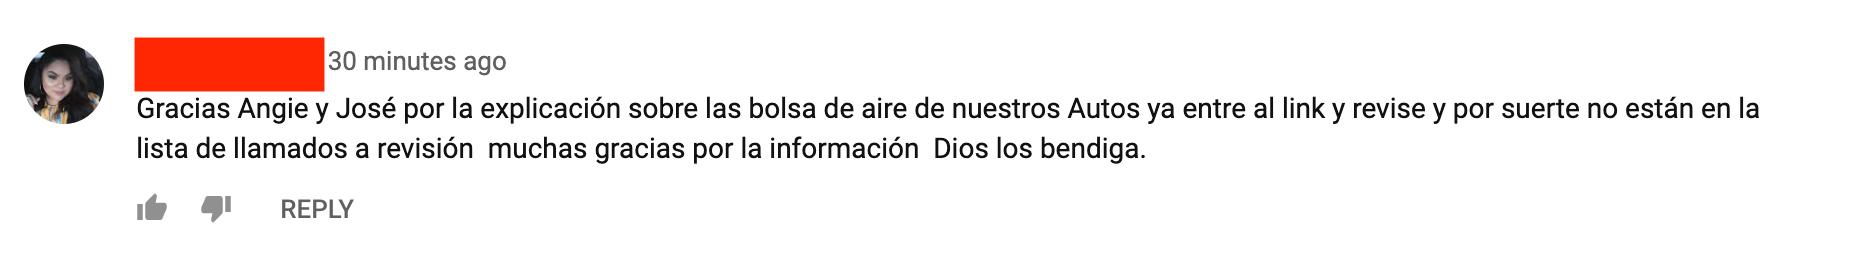 comment 3.png